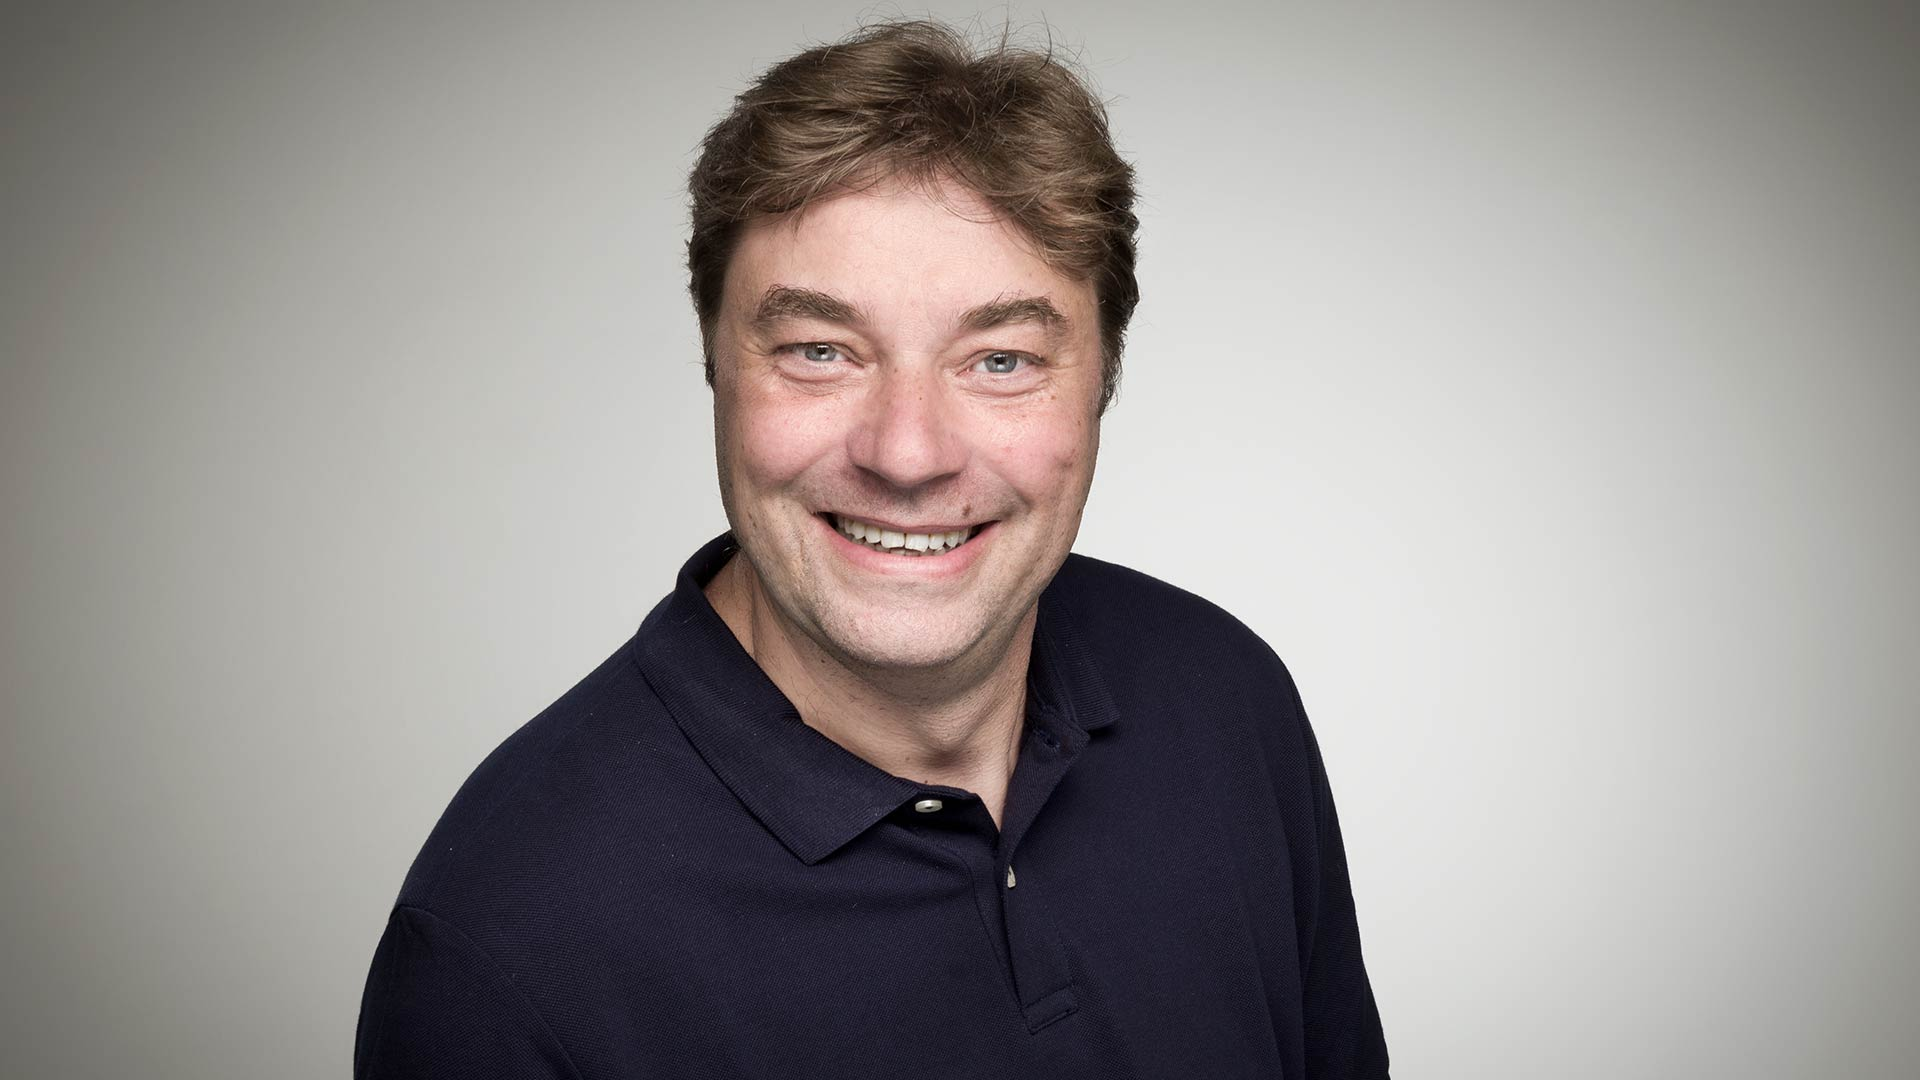 Michael Straube, Teamleiter Leitstelle der Osnabrücker Parkstätten-Betriebsgesellschaft